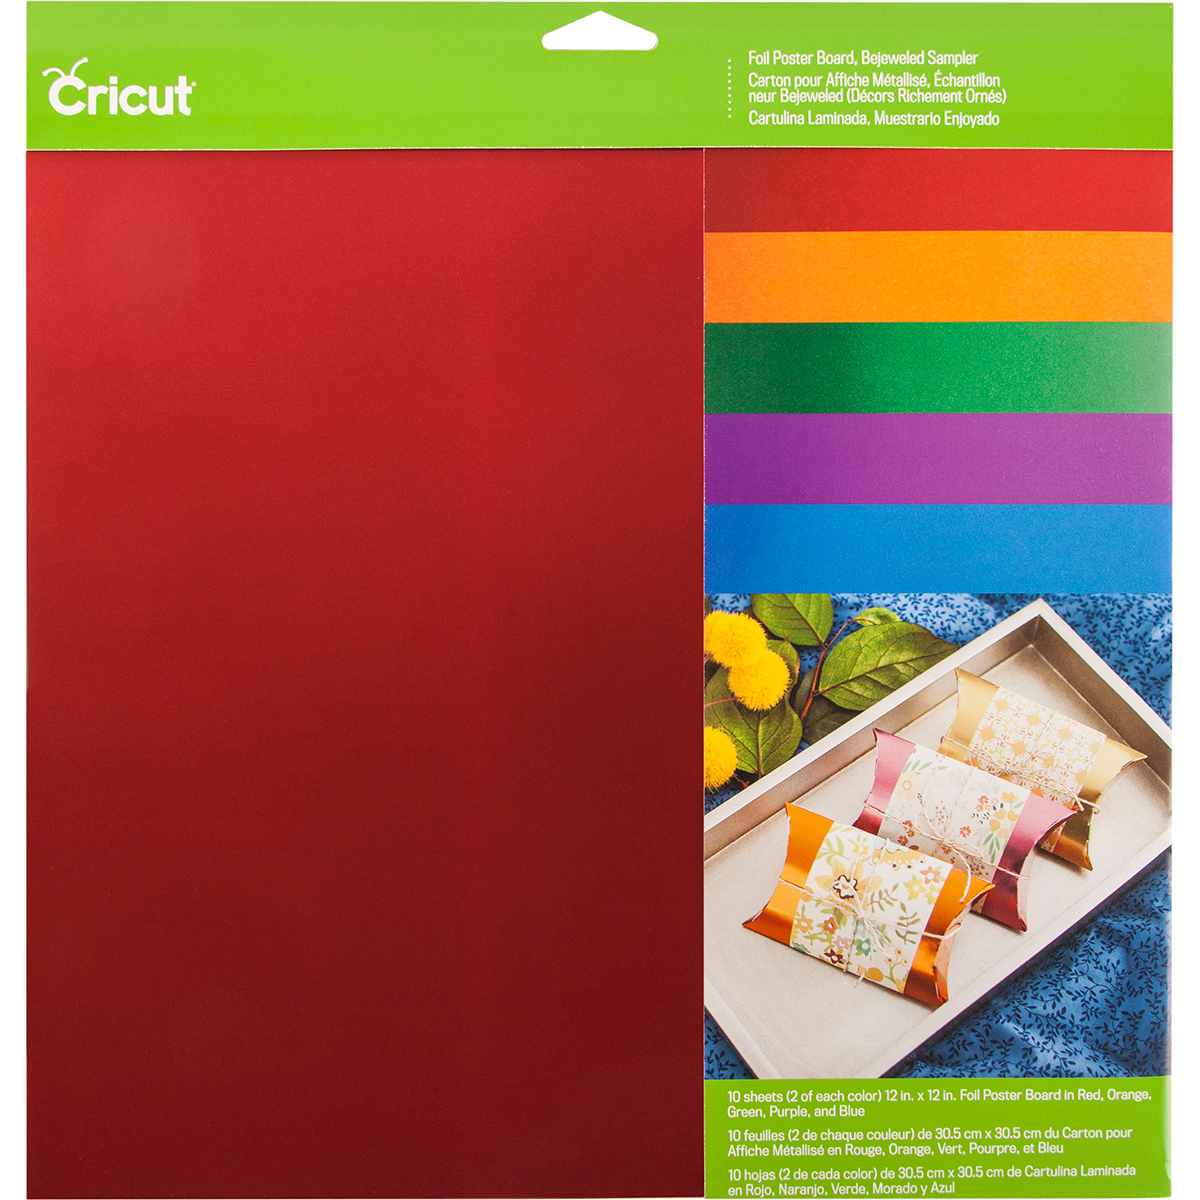 cricut poster board paper bejeweled sampler 12 x12 10 sheets